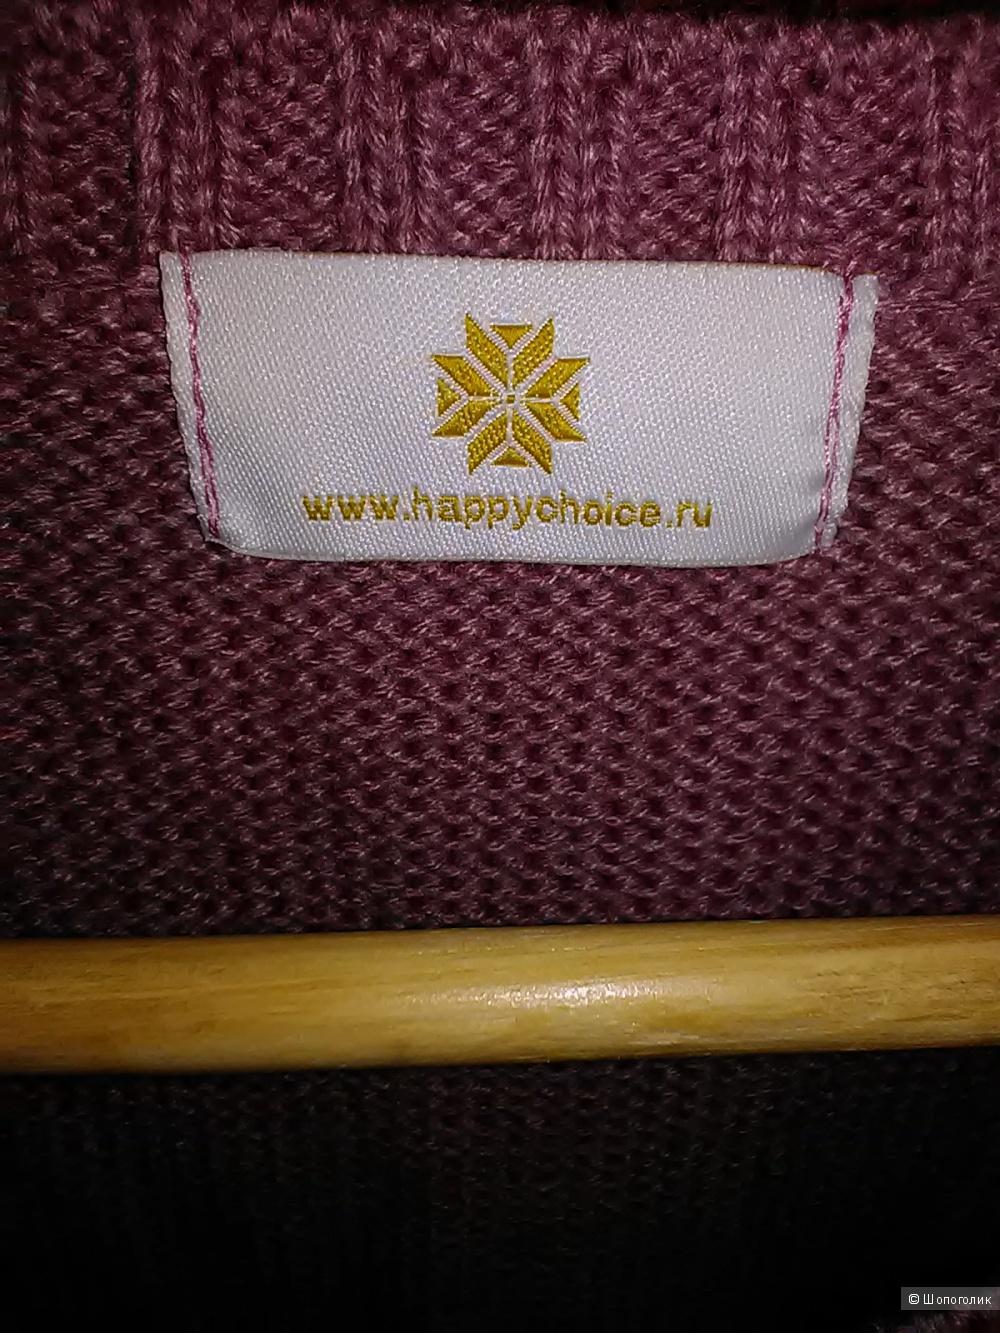 Джемпер фирмы Happy Choice 48 размера